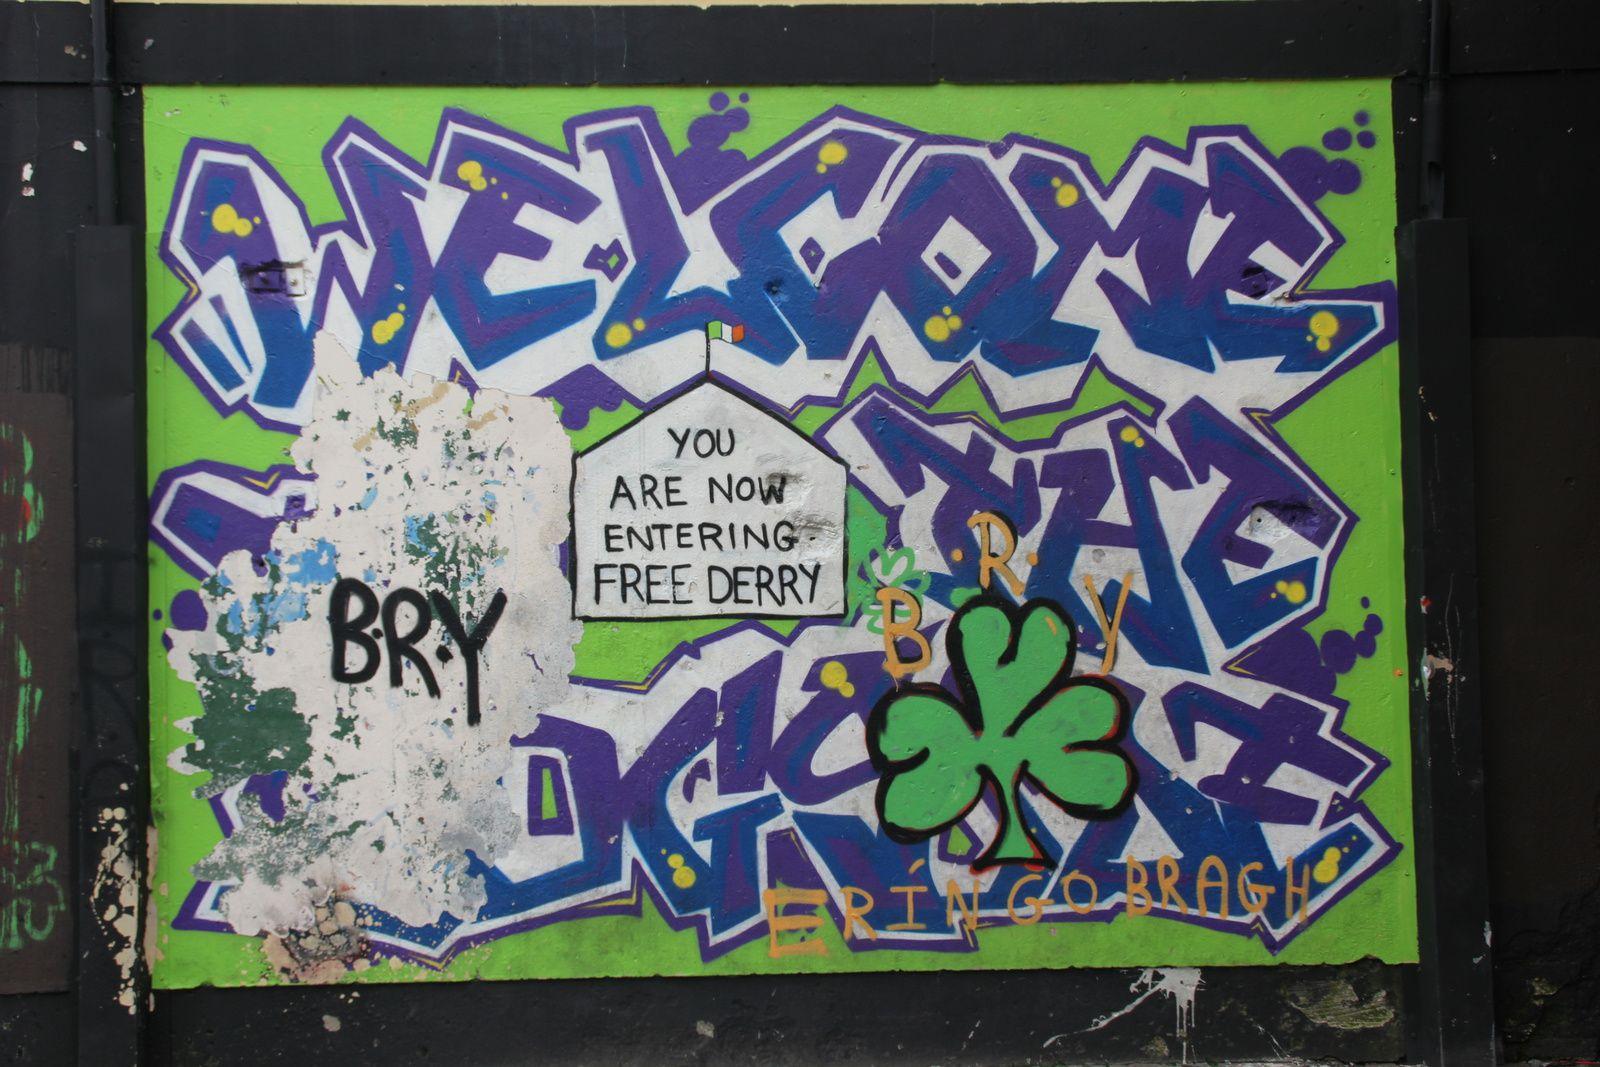 531) Rossville Street, Bogside, Derry/Londonderry